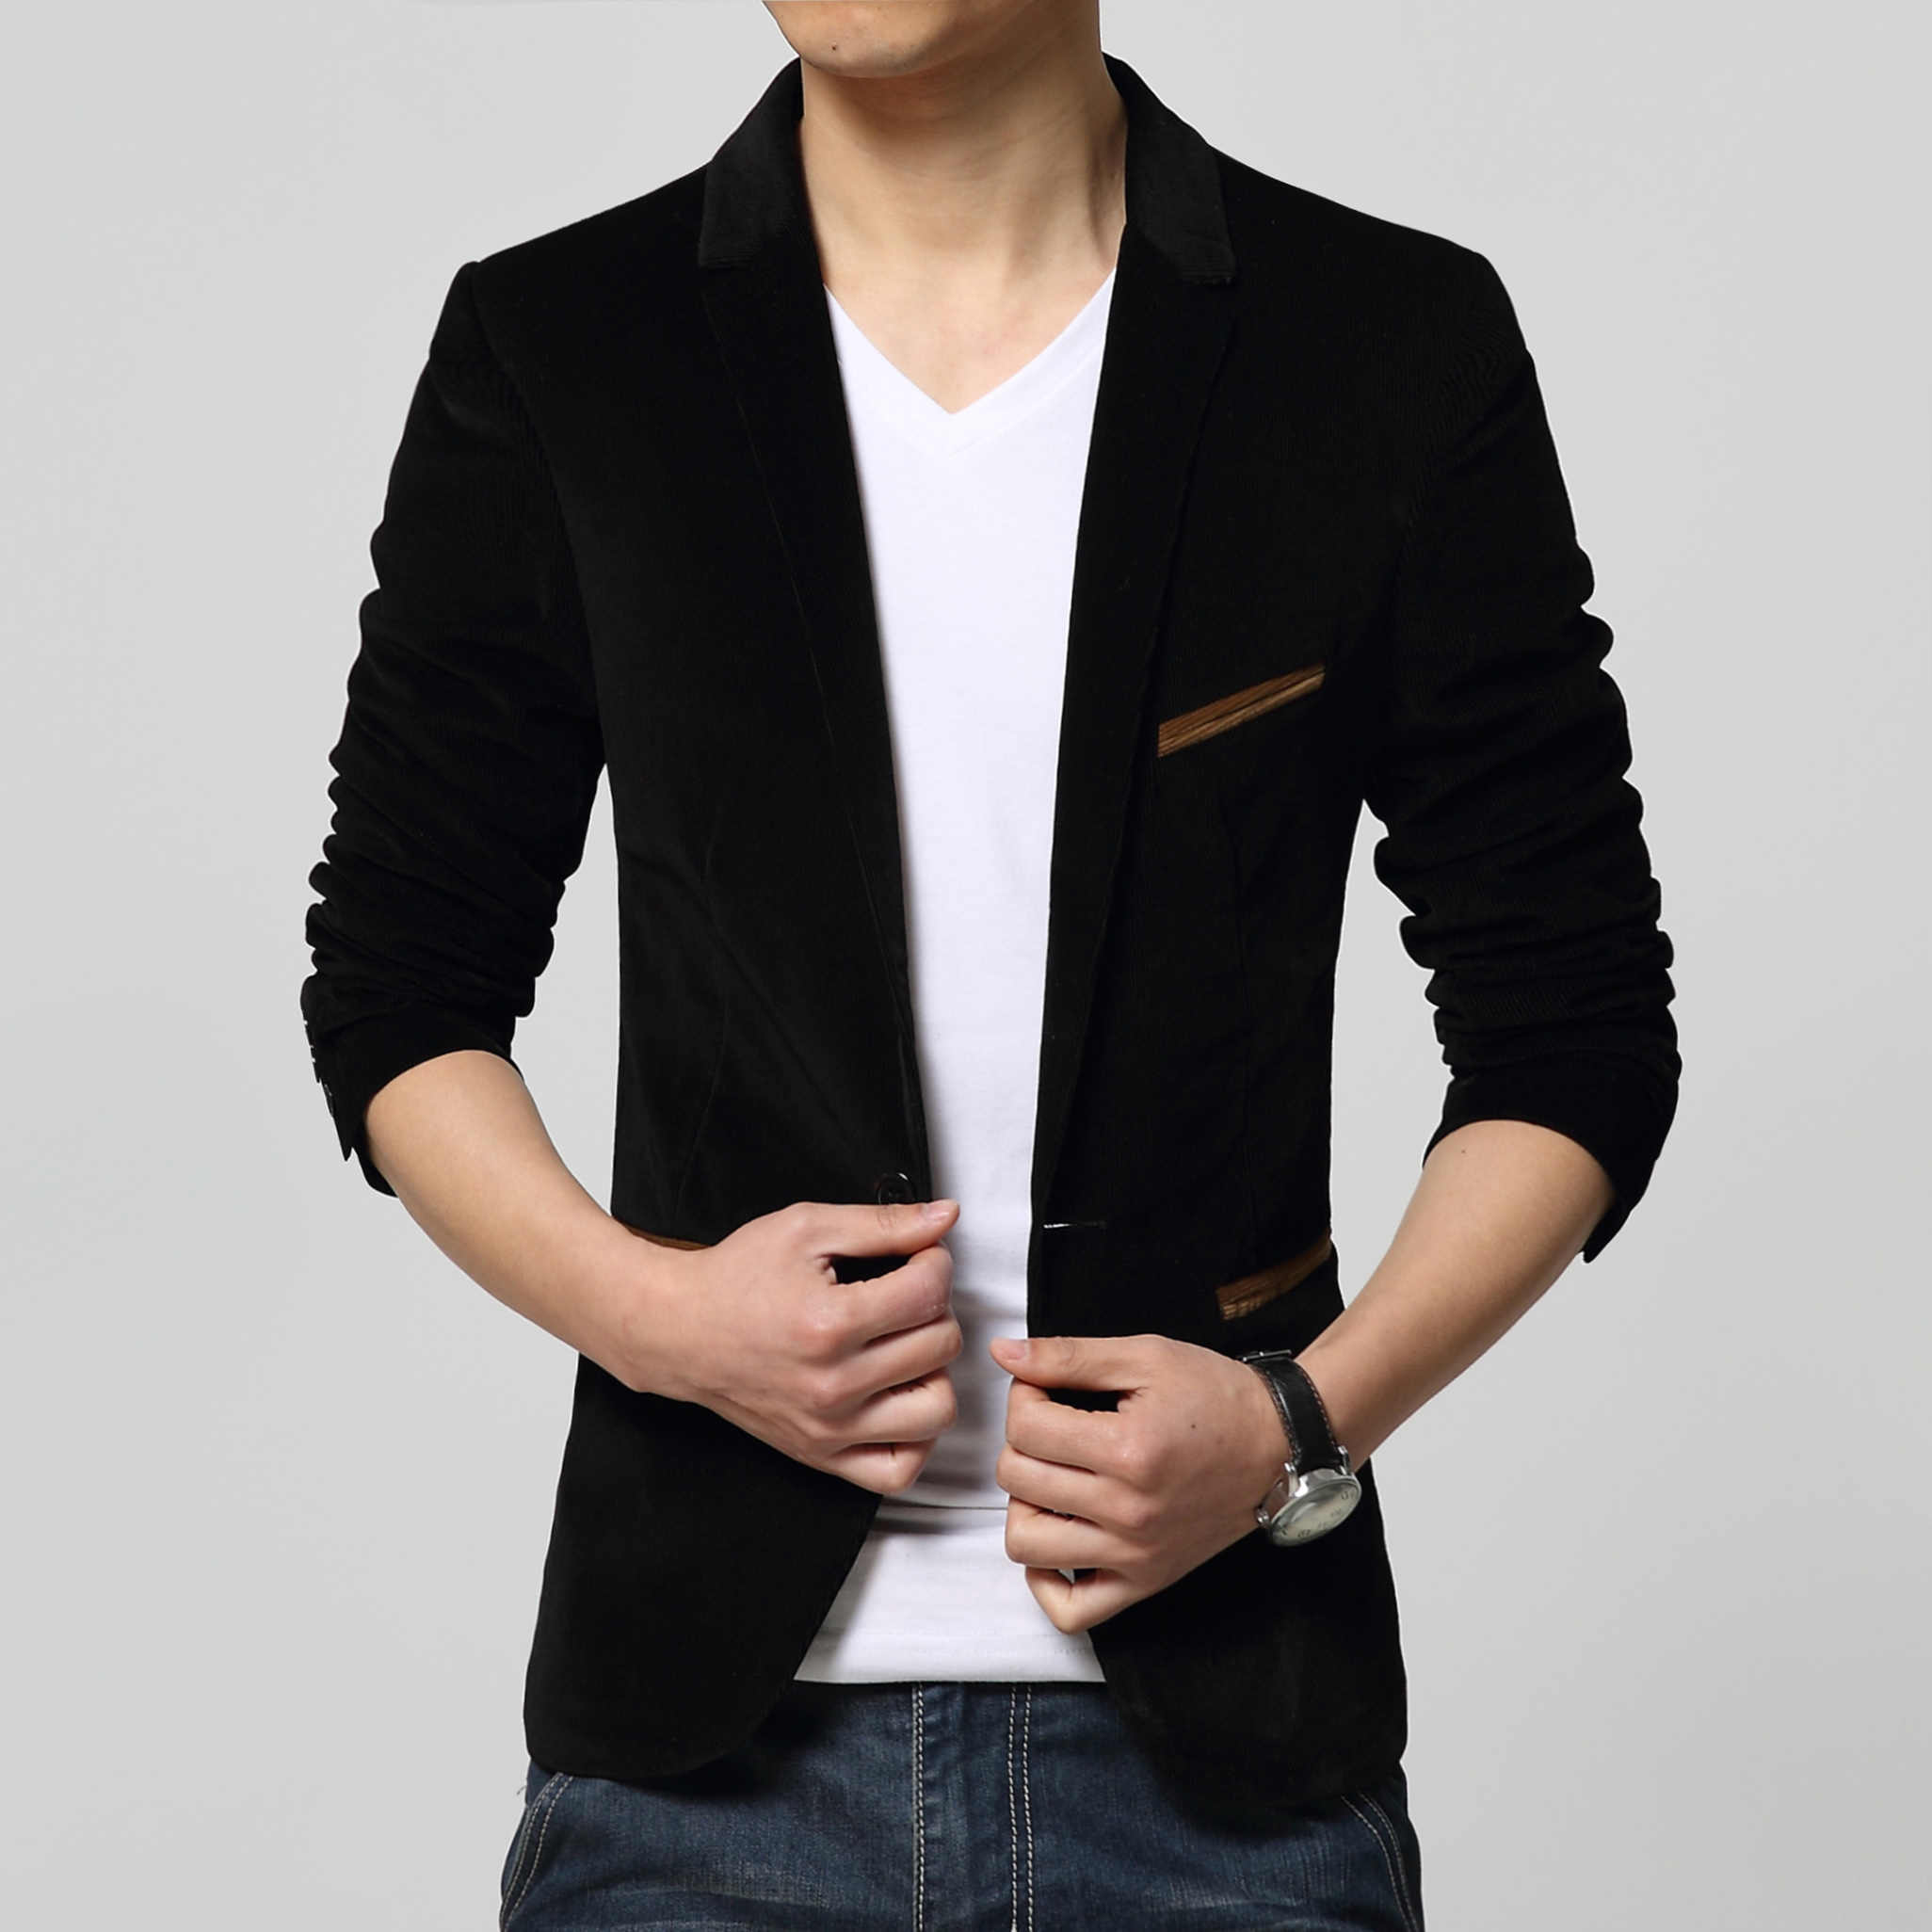 Men Casual Suit Slim Velvet Fit One Stylish Button Blazer Fashion Coat Jacket US